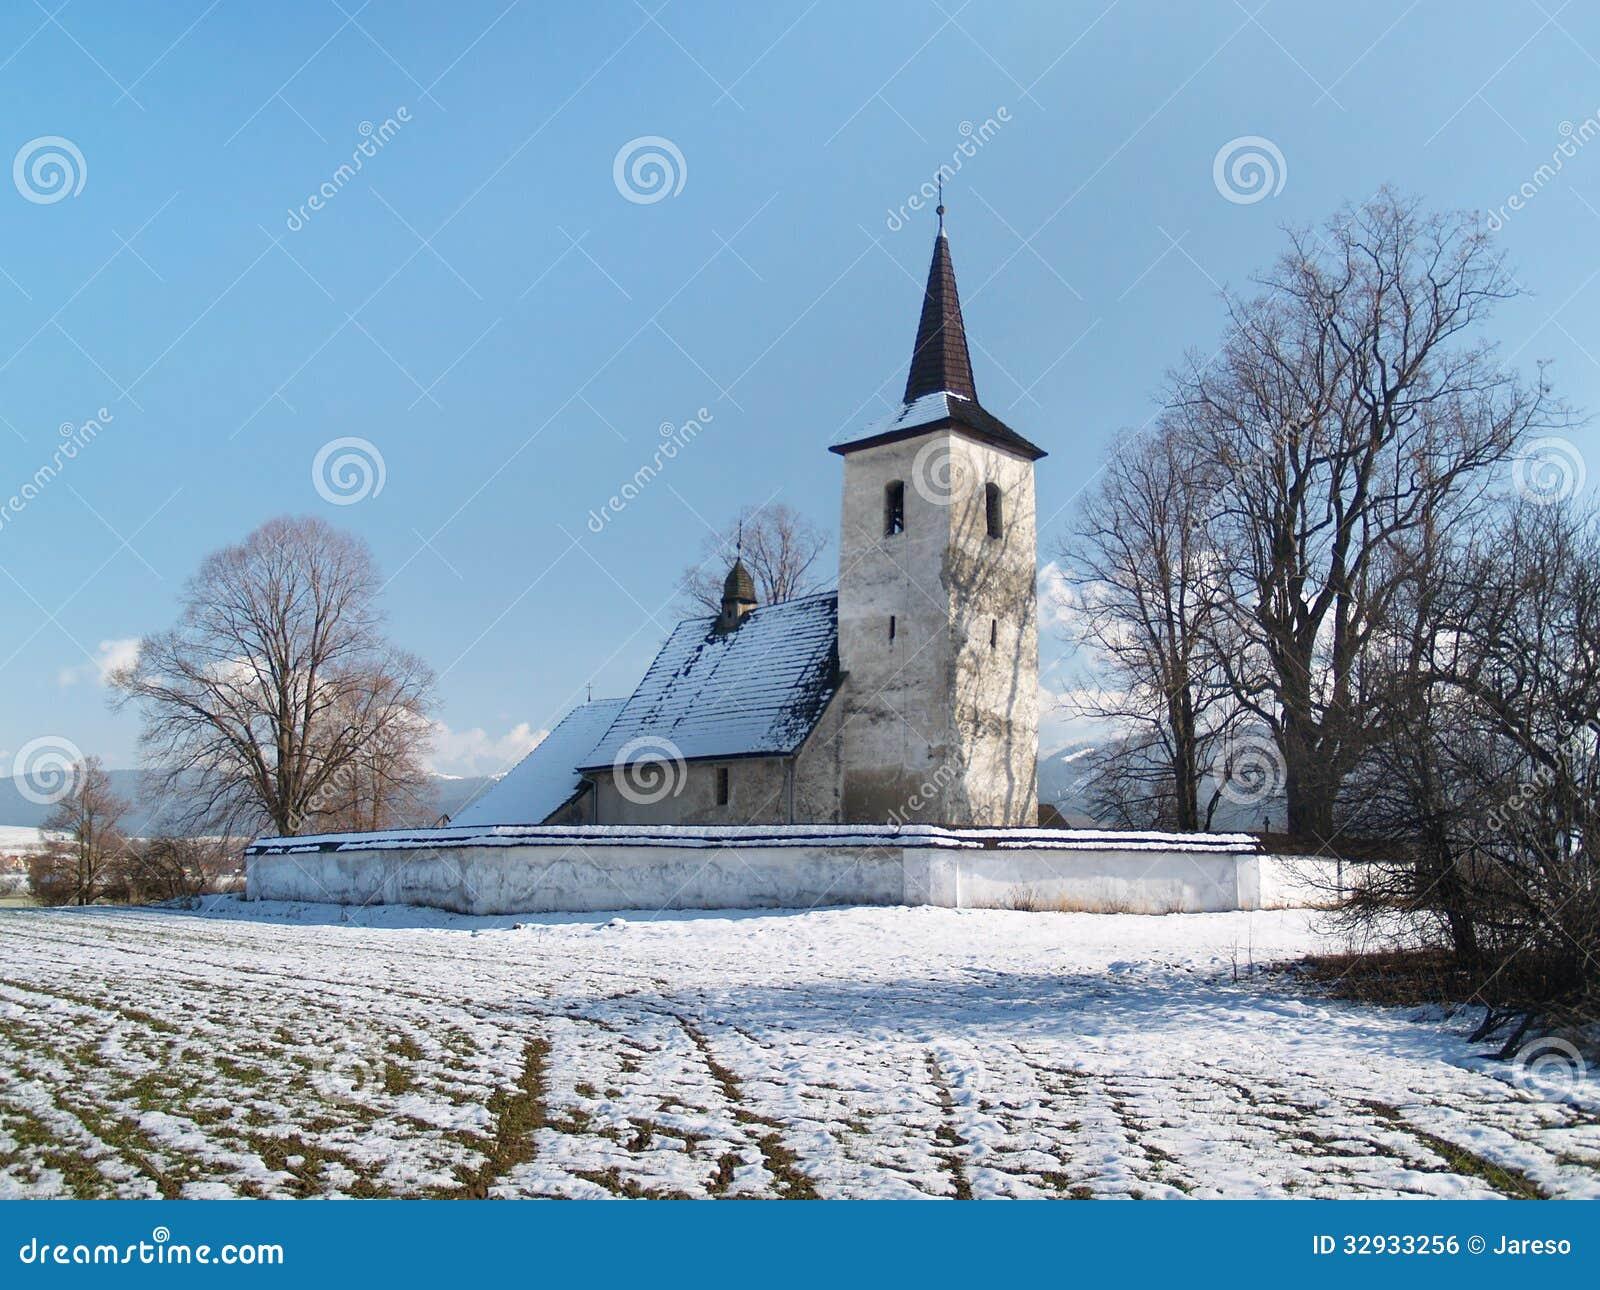 Winter view of All Saints church in Ludrova